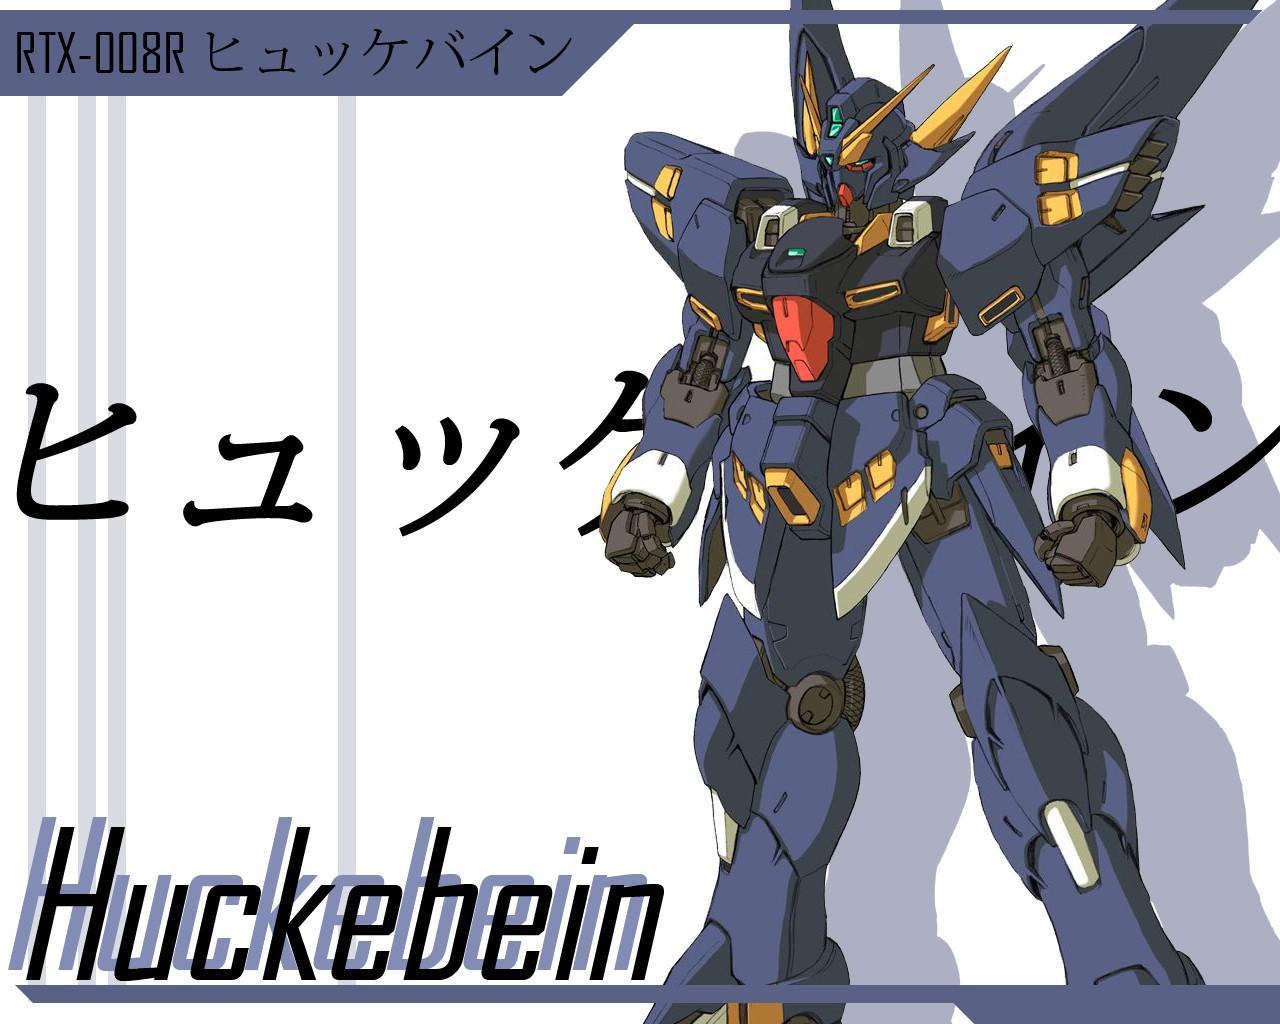 Wallpaper Anime Cartoon Machine Comics Super Robot Wars Super Robot Wars Og Mecha Action Figure 1280x1024 Ludendorf 18340 Hd Wallpapers Wallhere